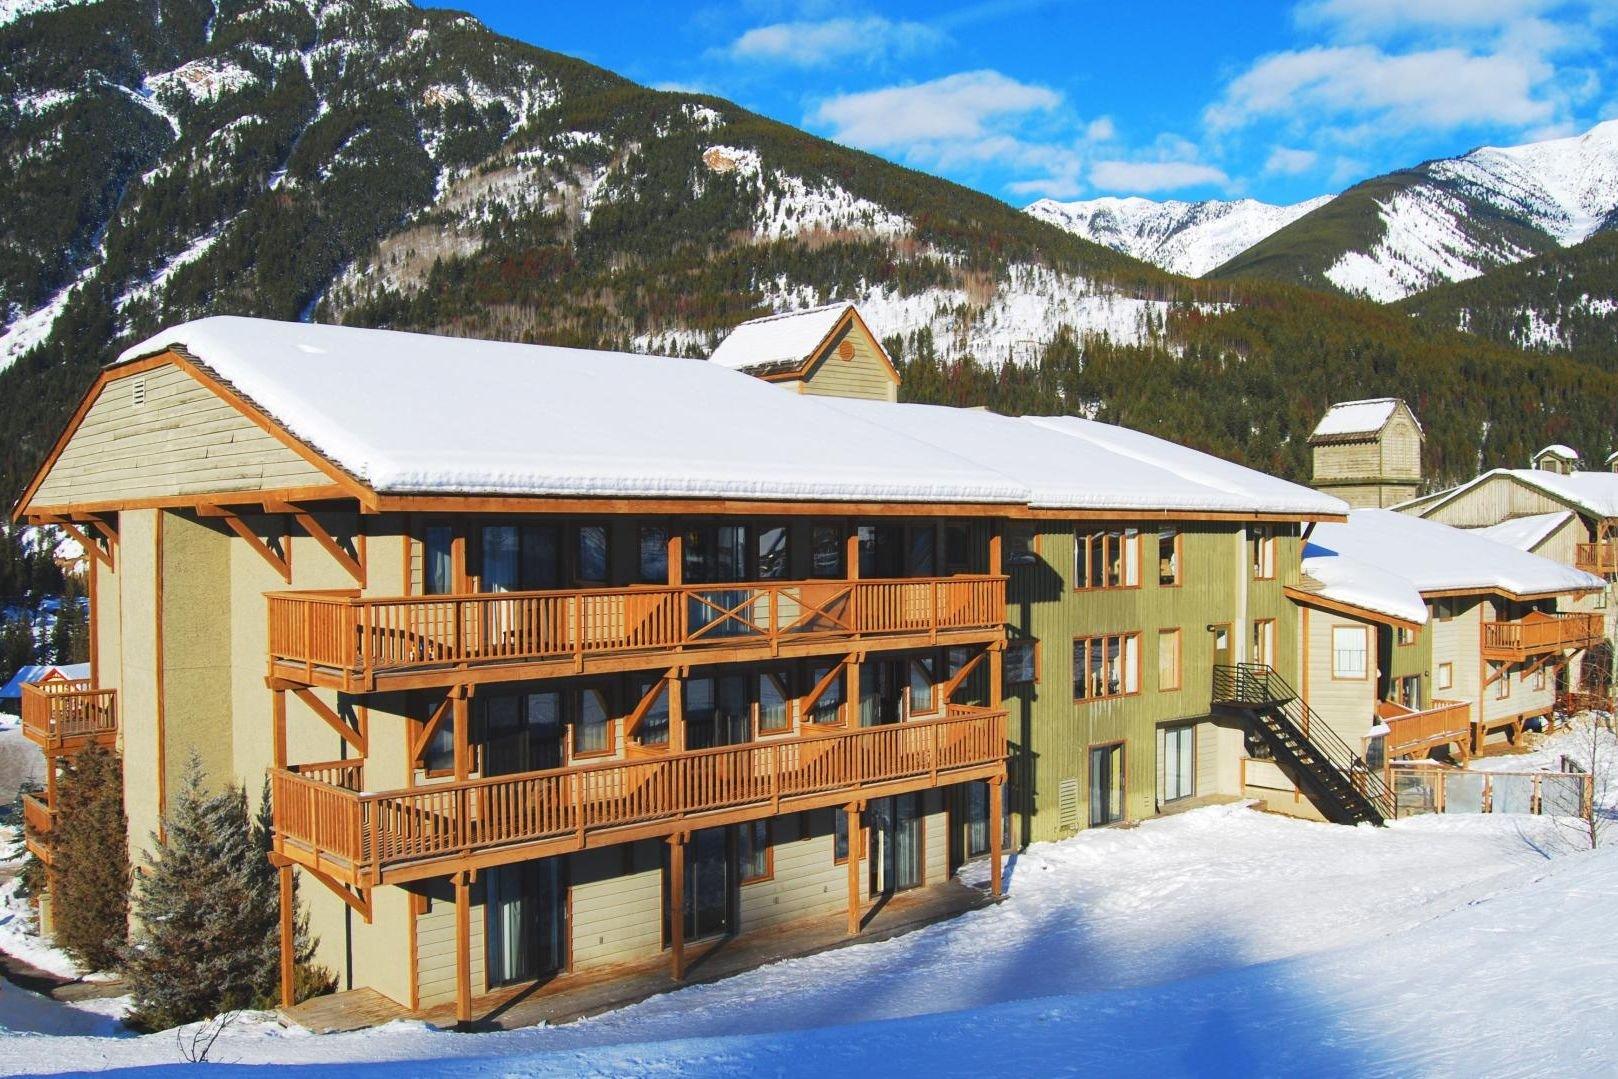 Panorama Mountain Village - pine inn exteror.jpg